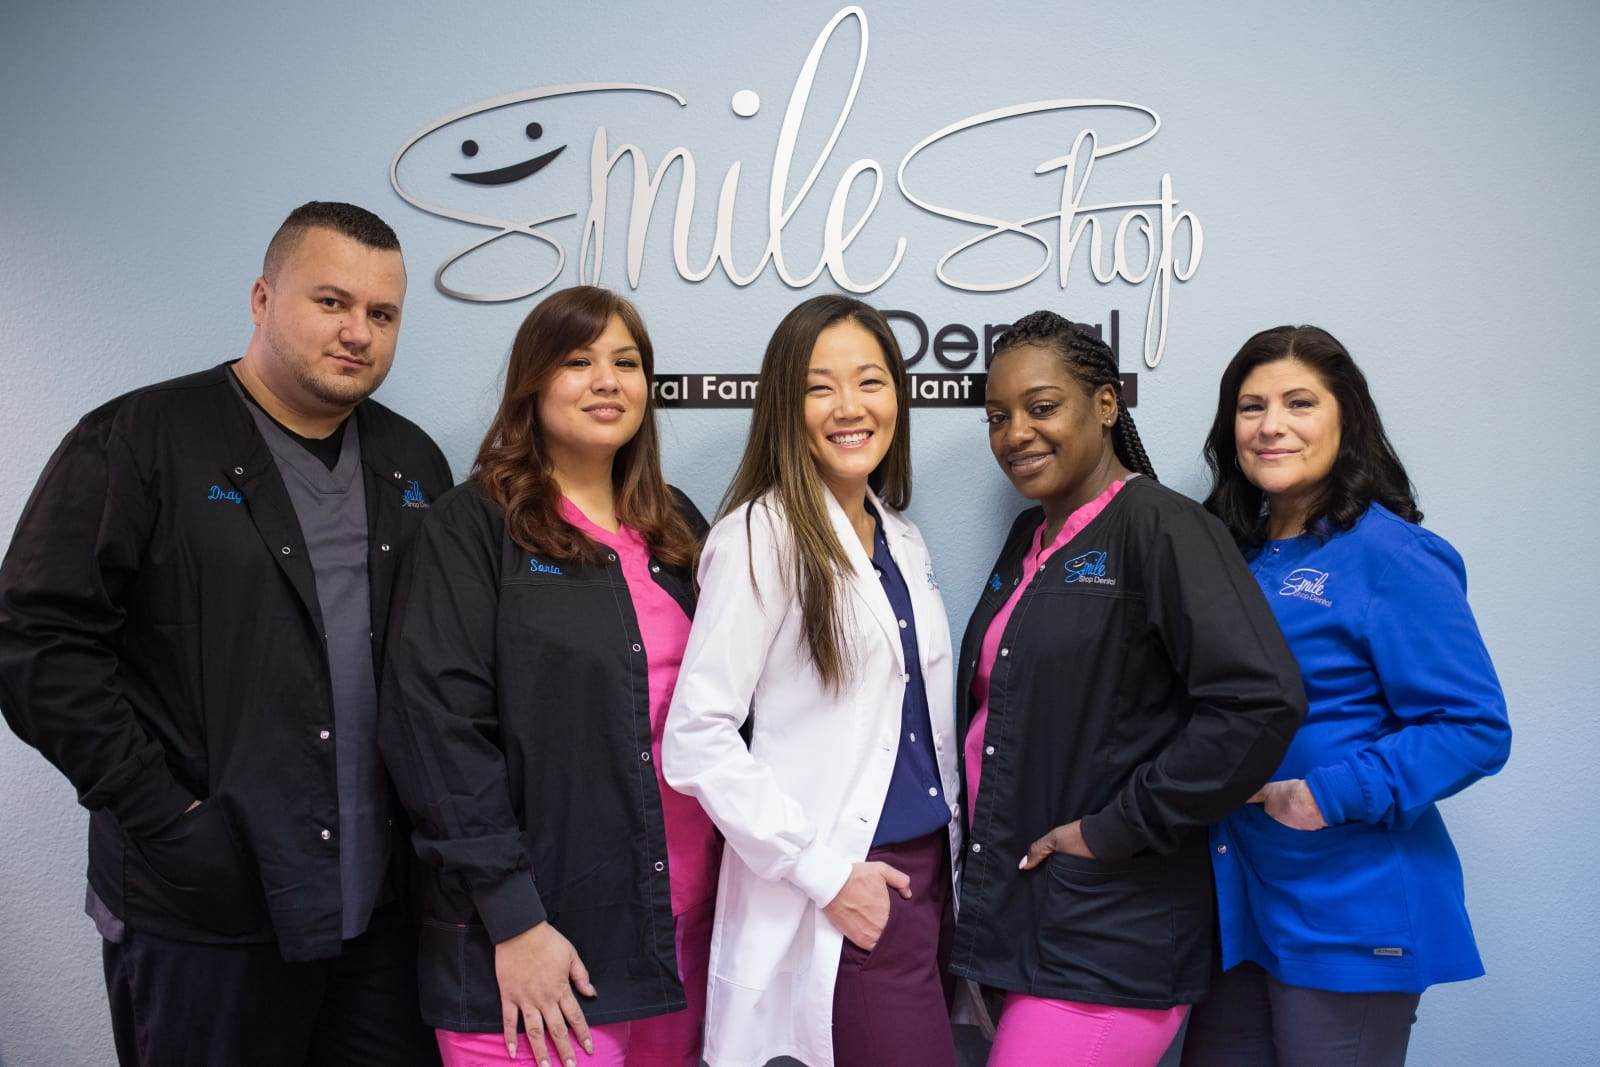 Smile Shop Team